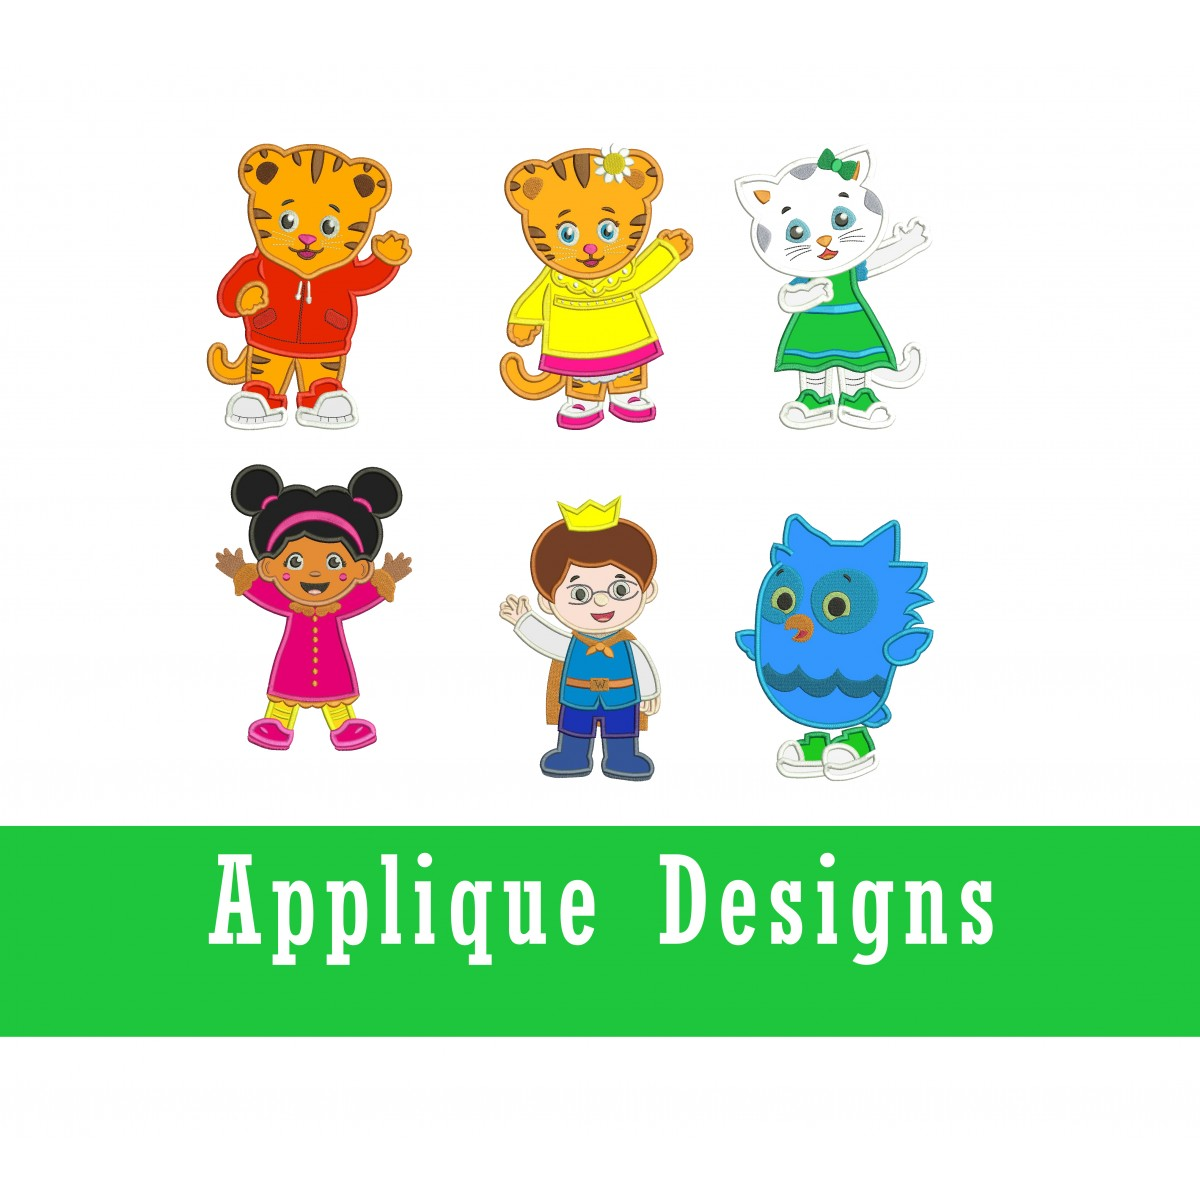 Fifth birthday Embroidery Designs Birthday design applique Daniel Tiger birthday design Daniel Tiger Five Applique Embroidery Designs